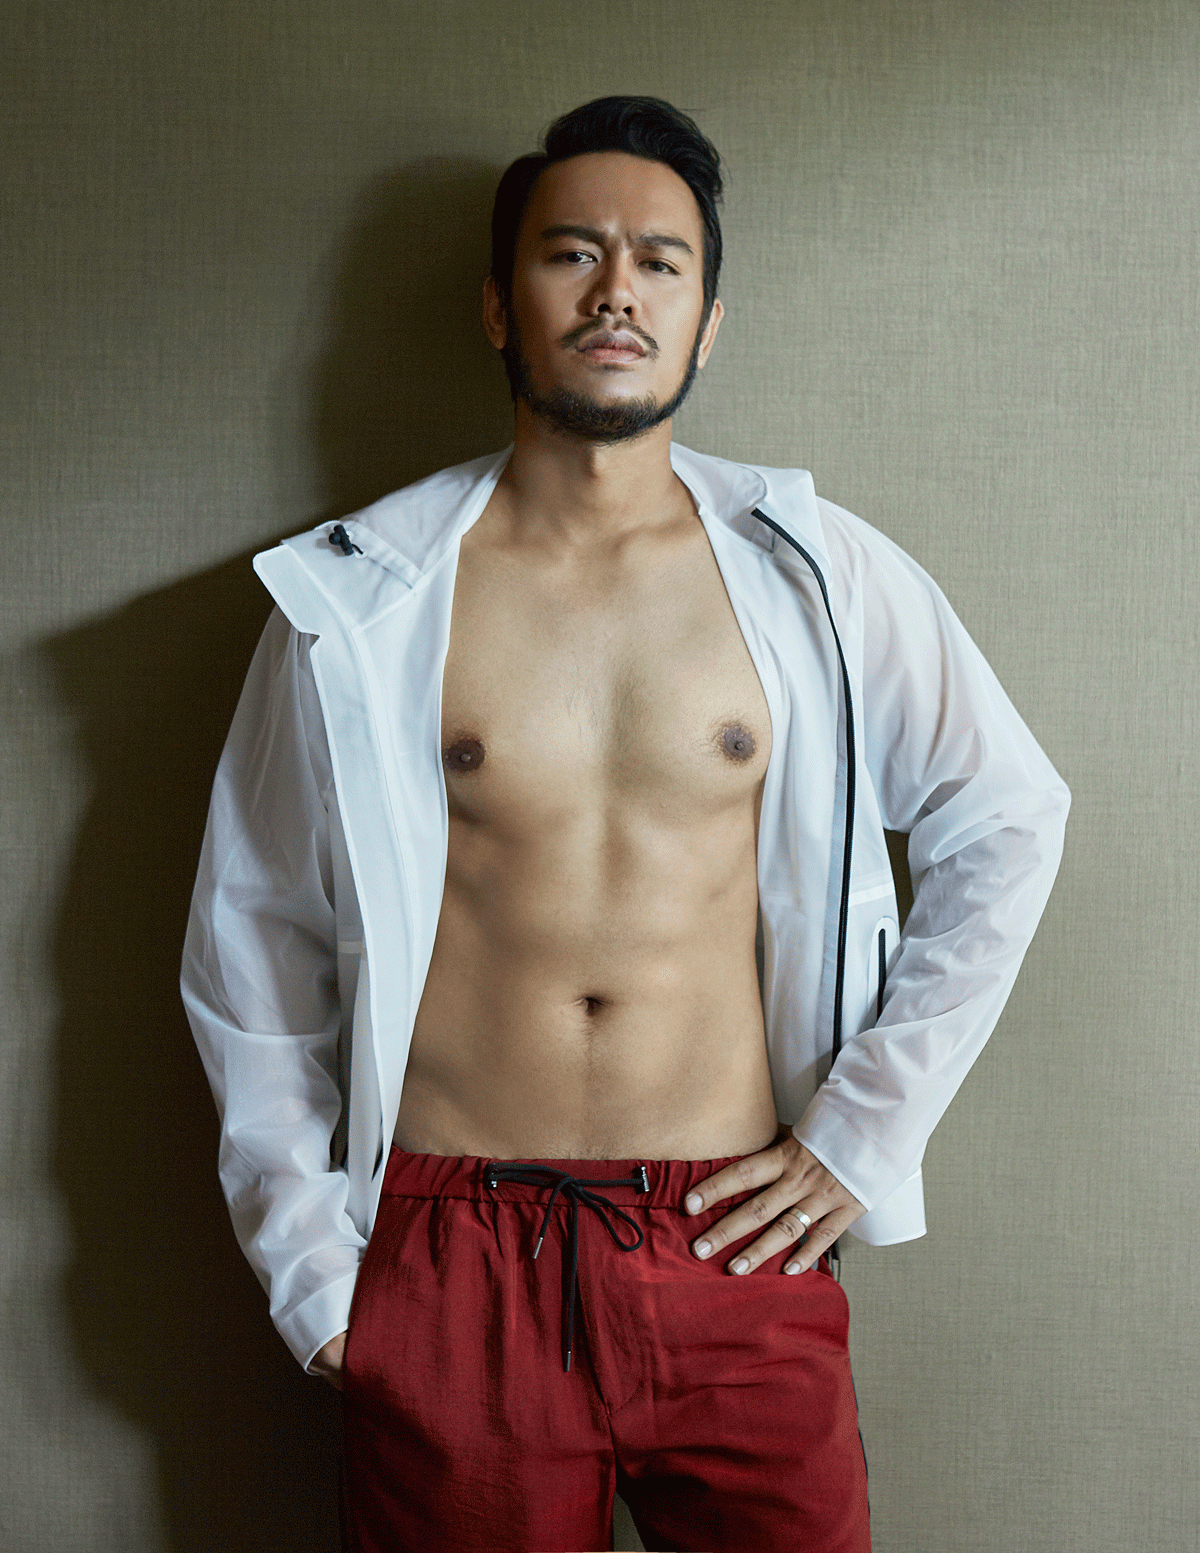 jacket and pants : Emporio Armani / shirt : Calvin Klien Platinum